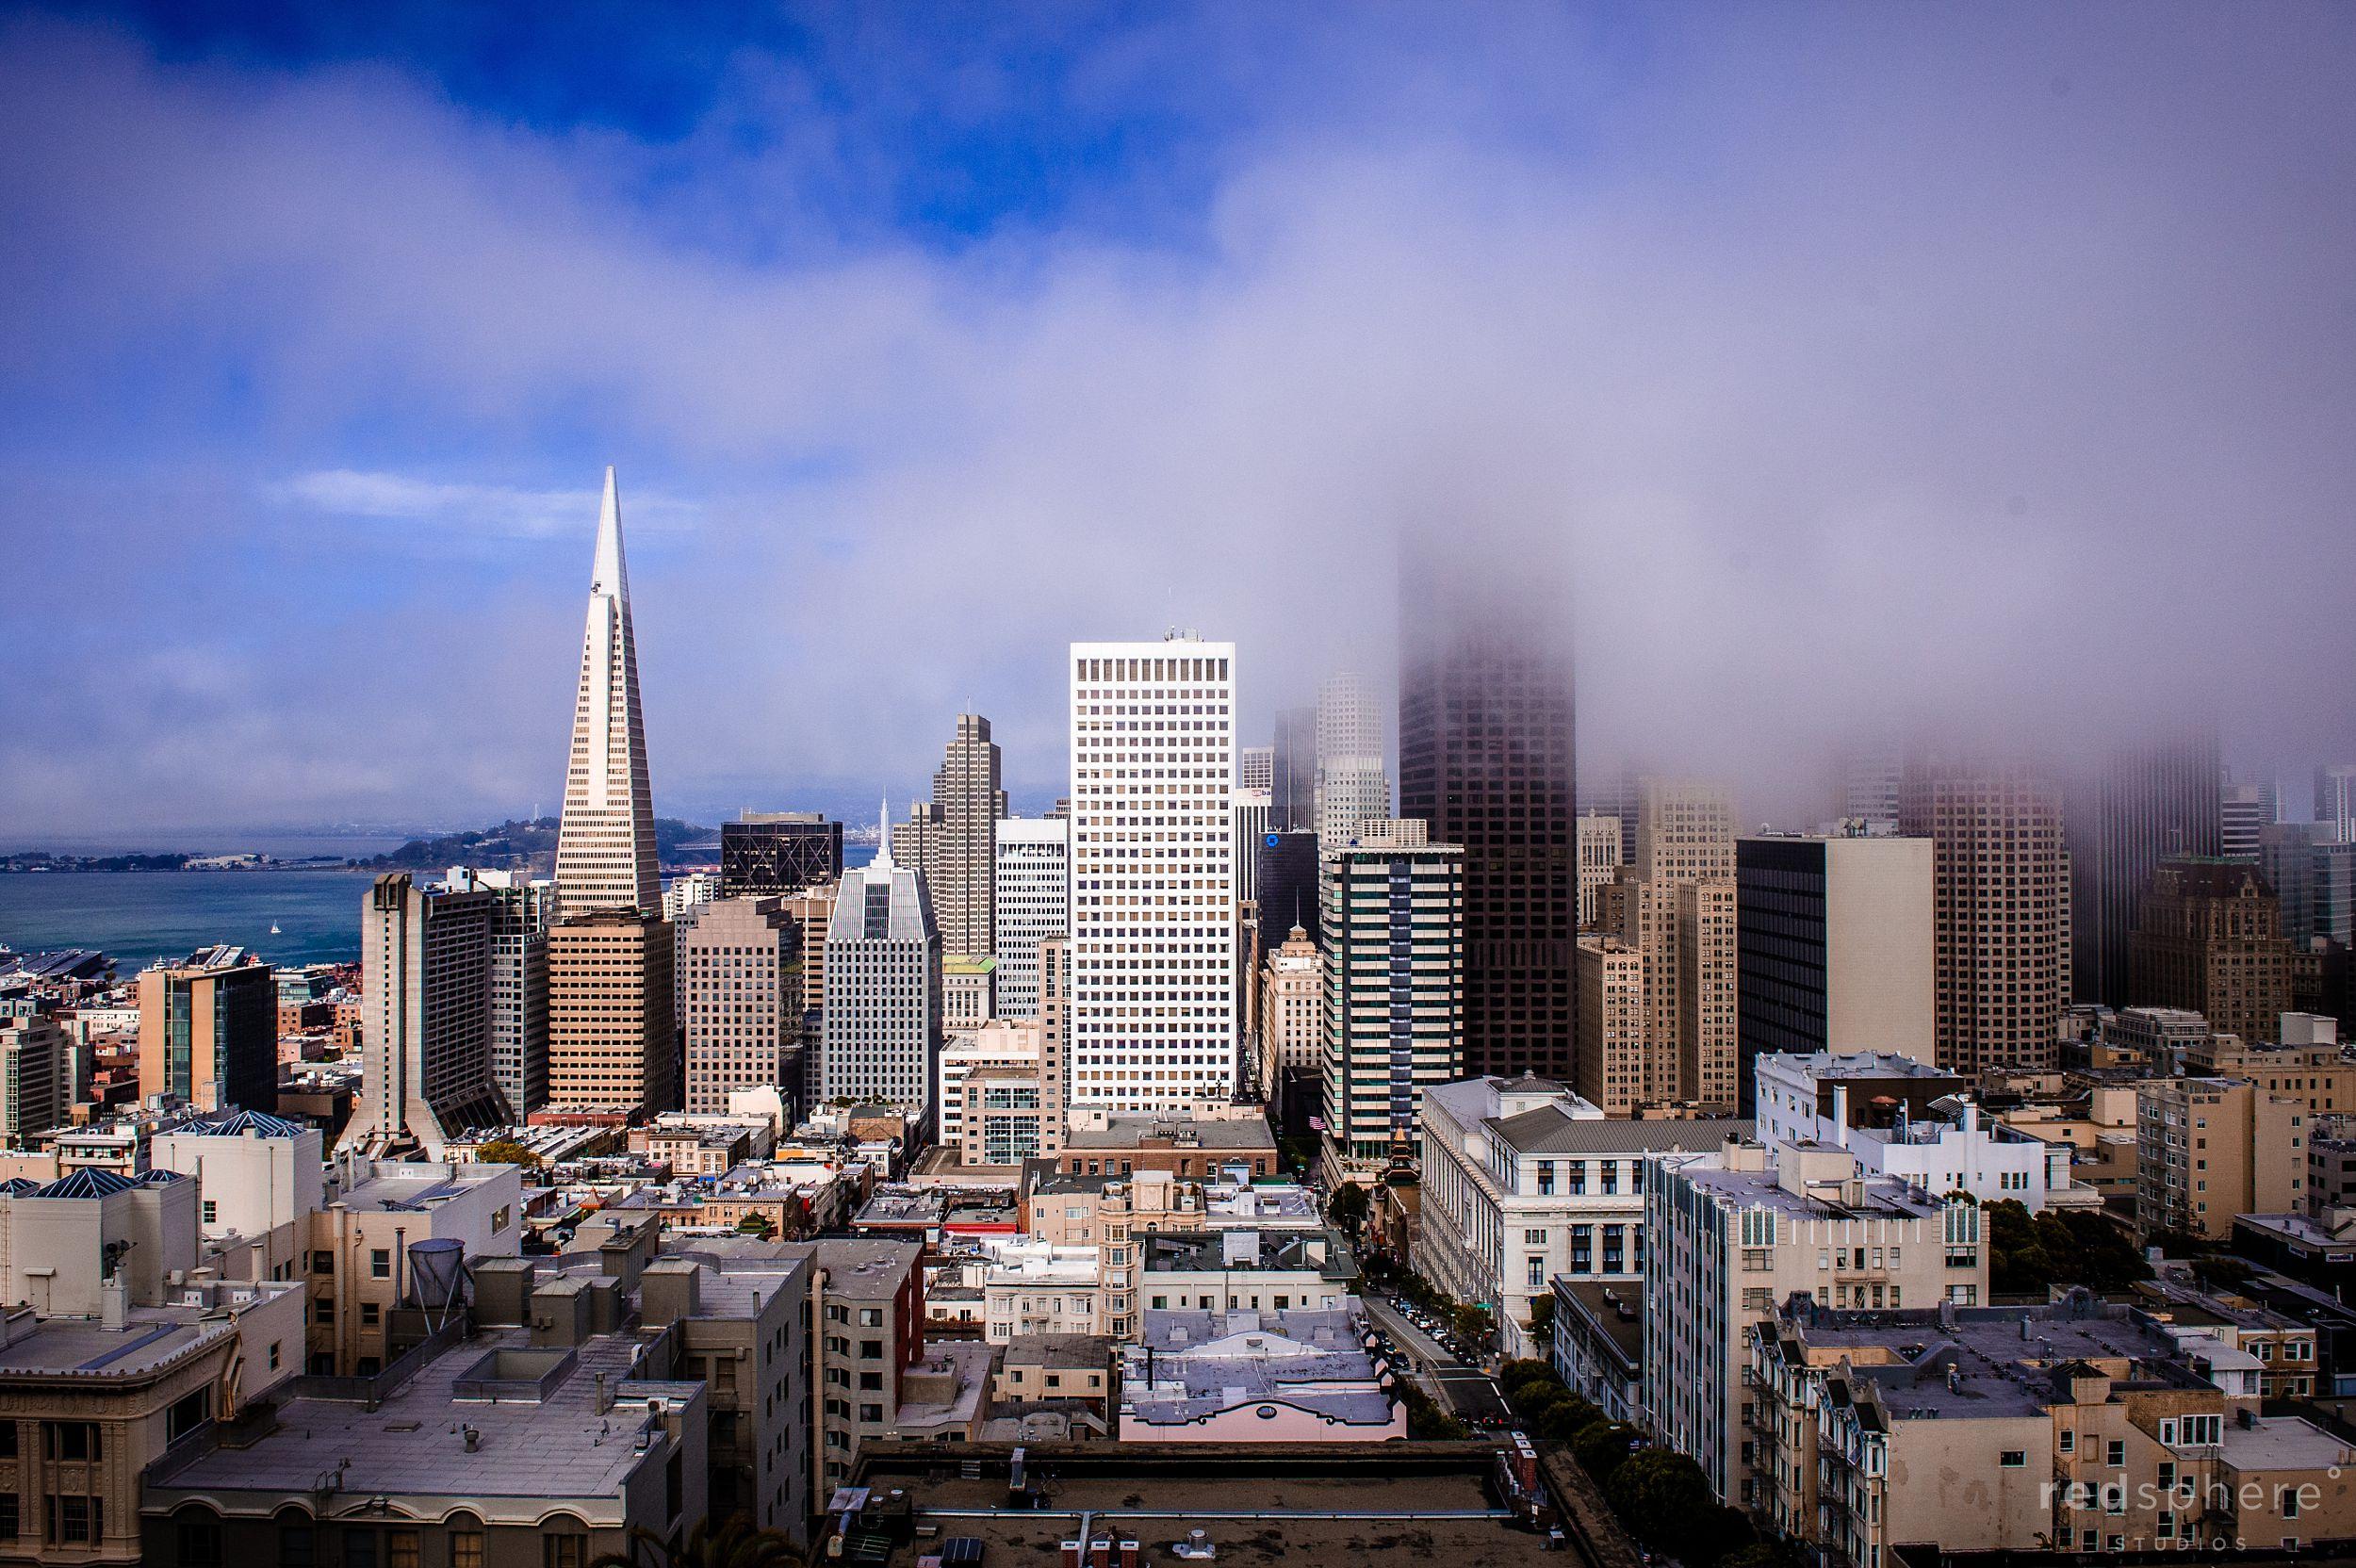 Foggy San Francisco Skyline From Fairmont Hotel Penthouse Wedding